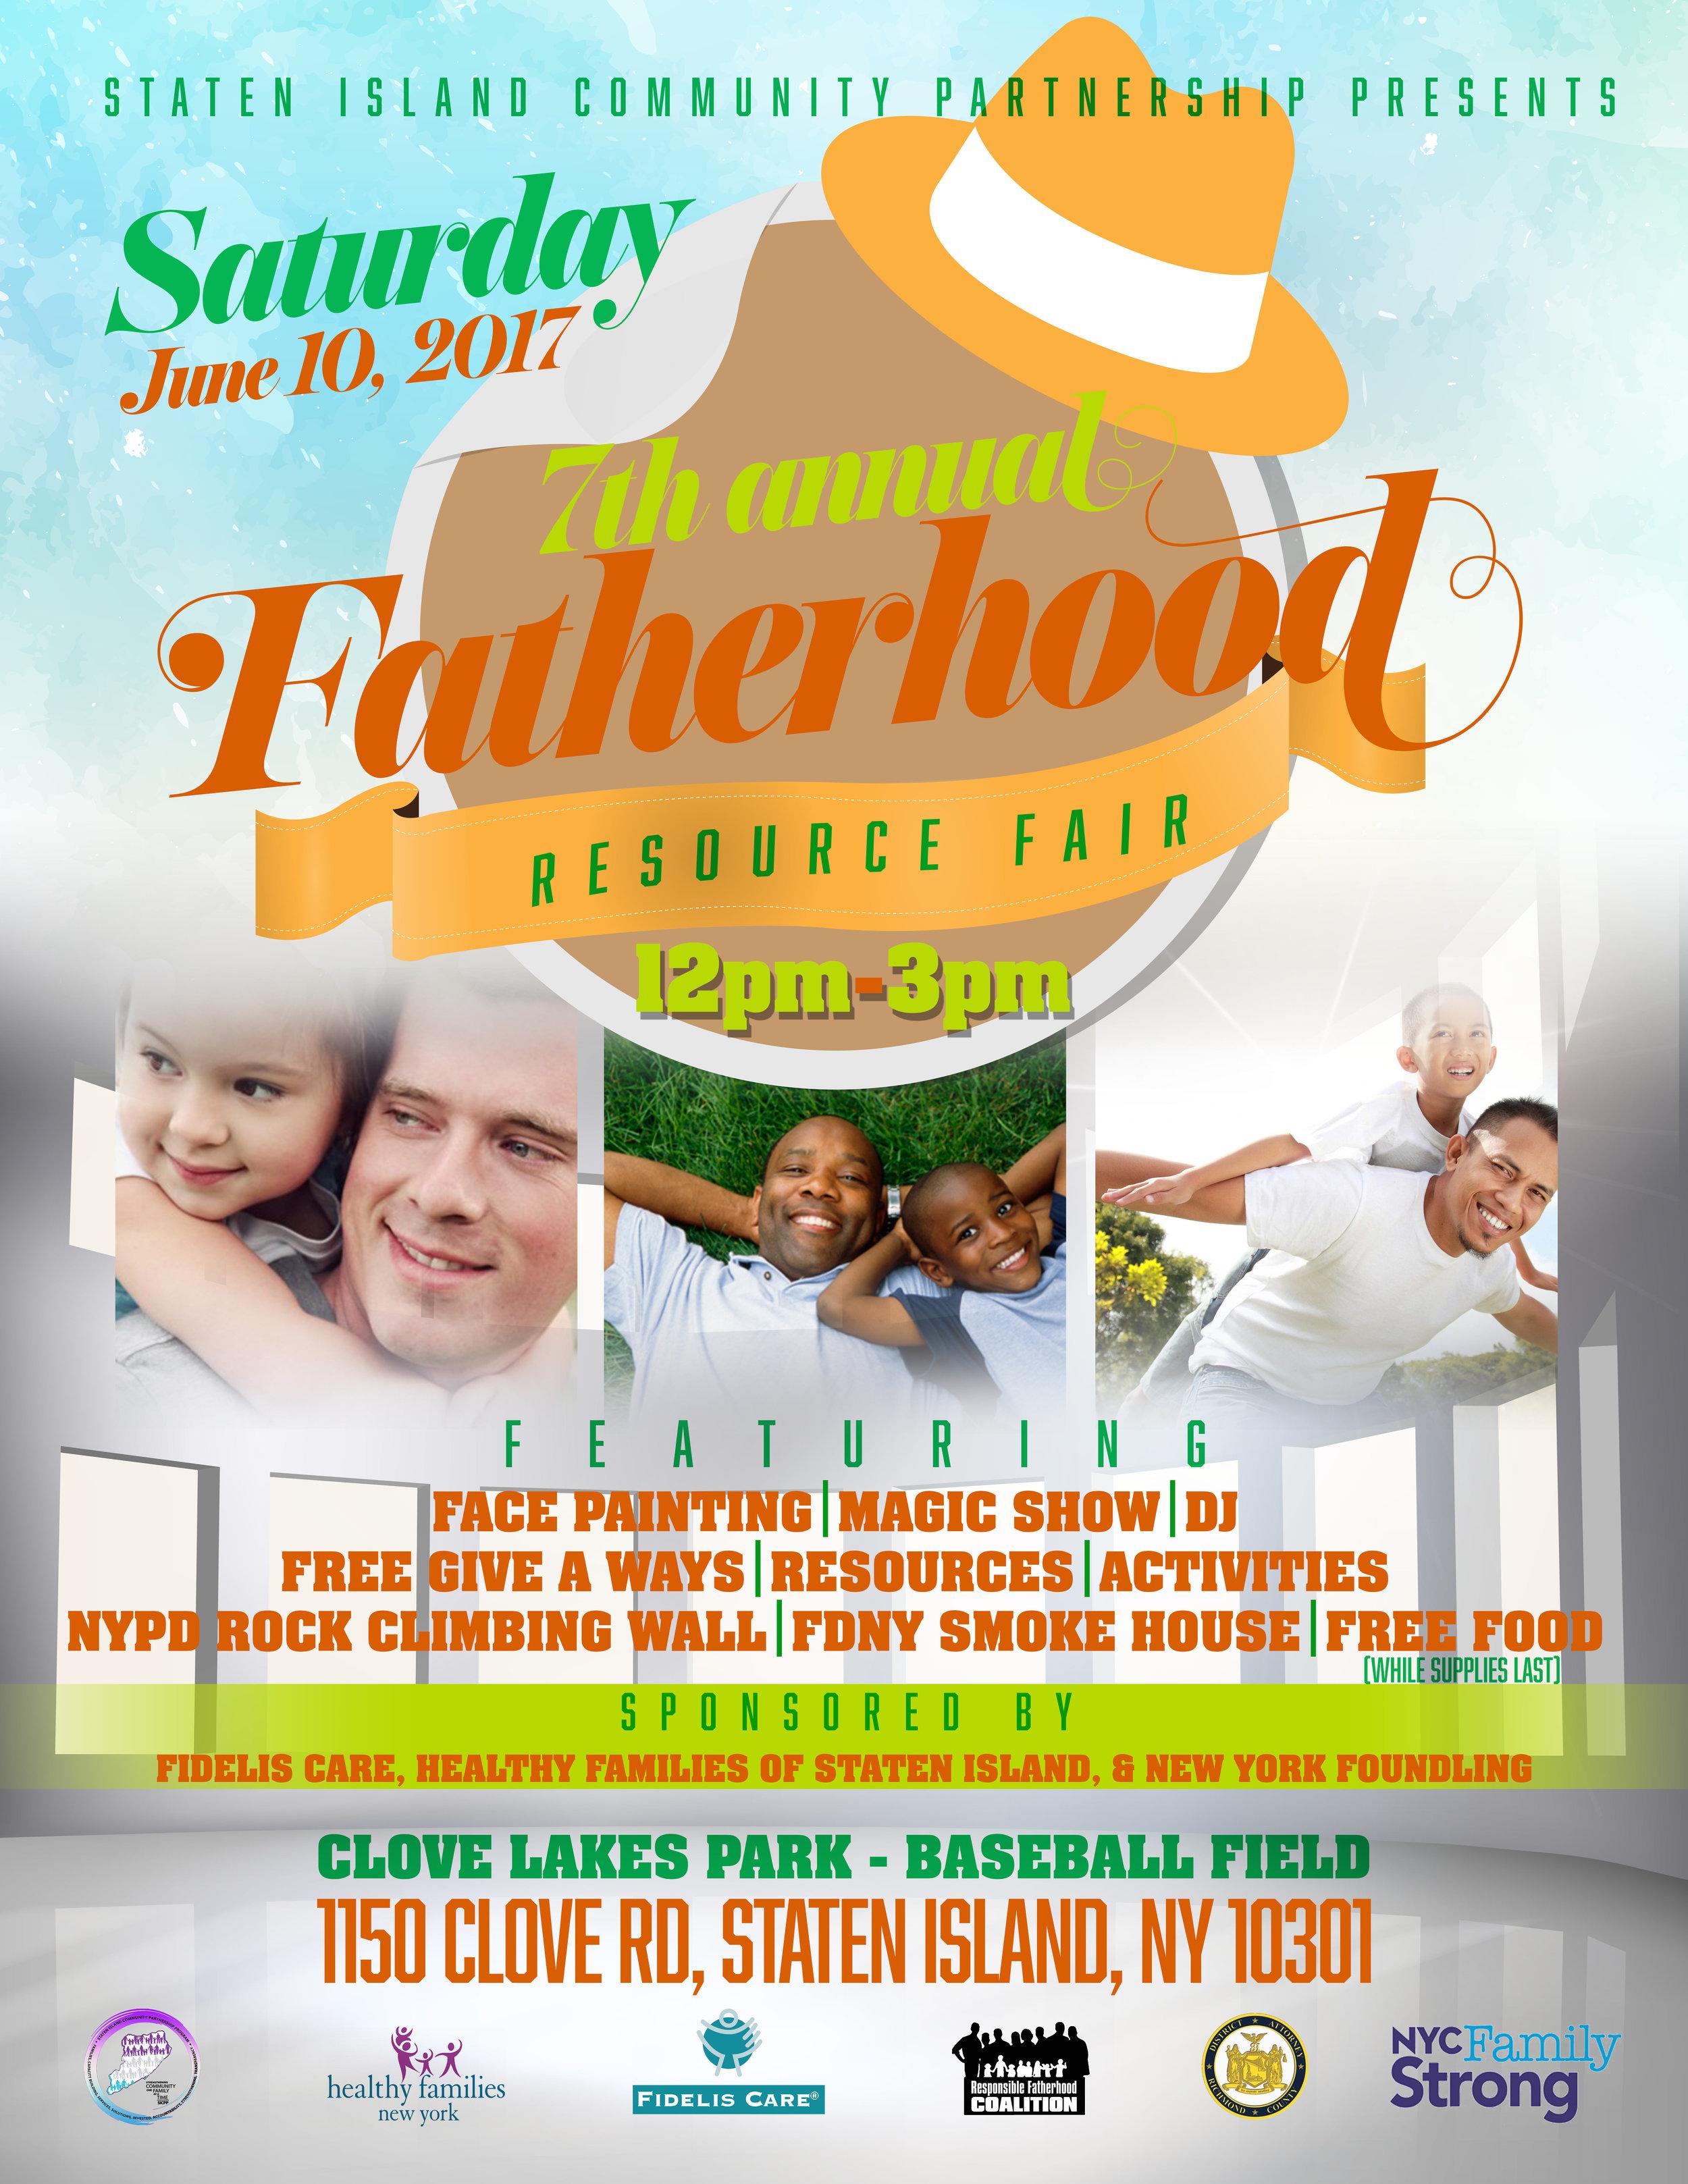 7th Annual Fatherhood-Flyer.jpg